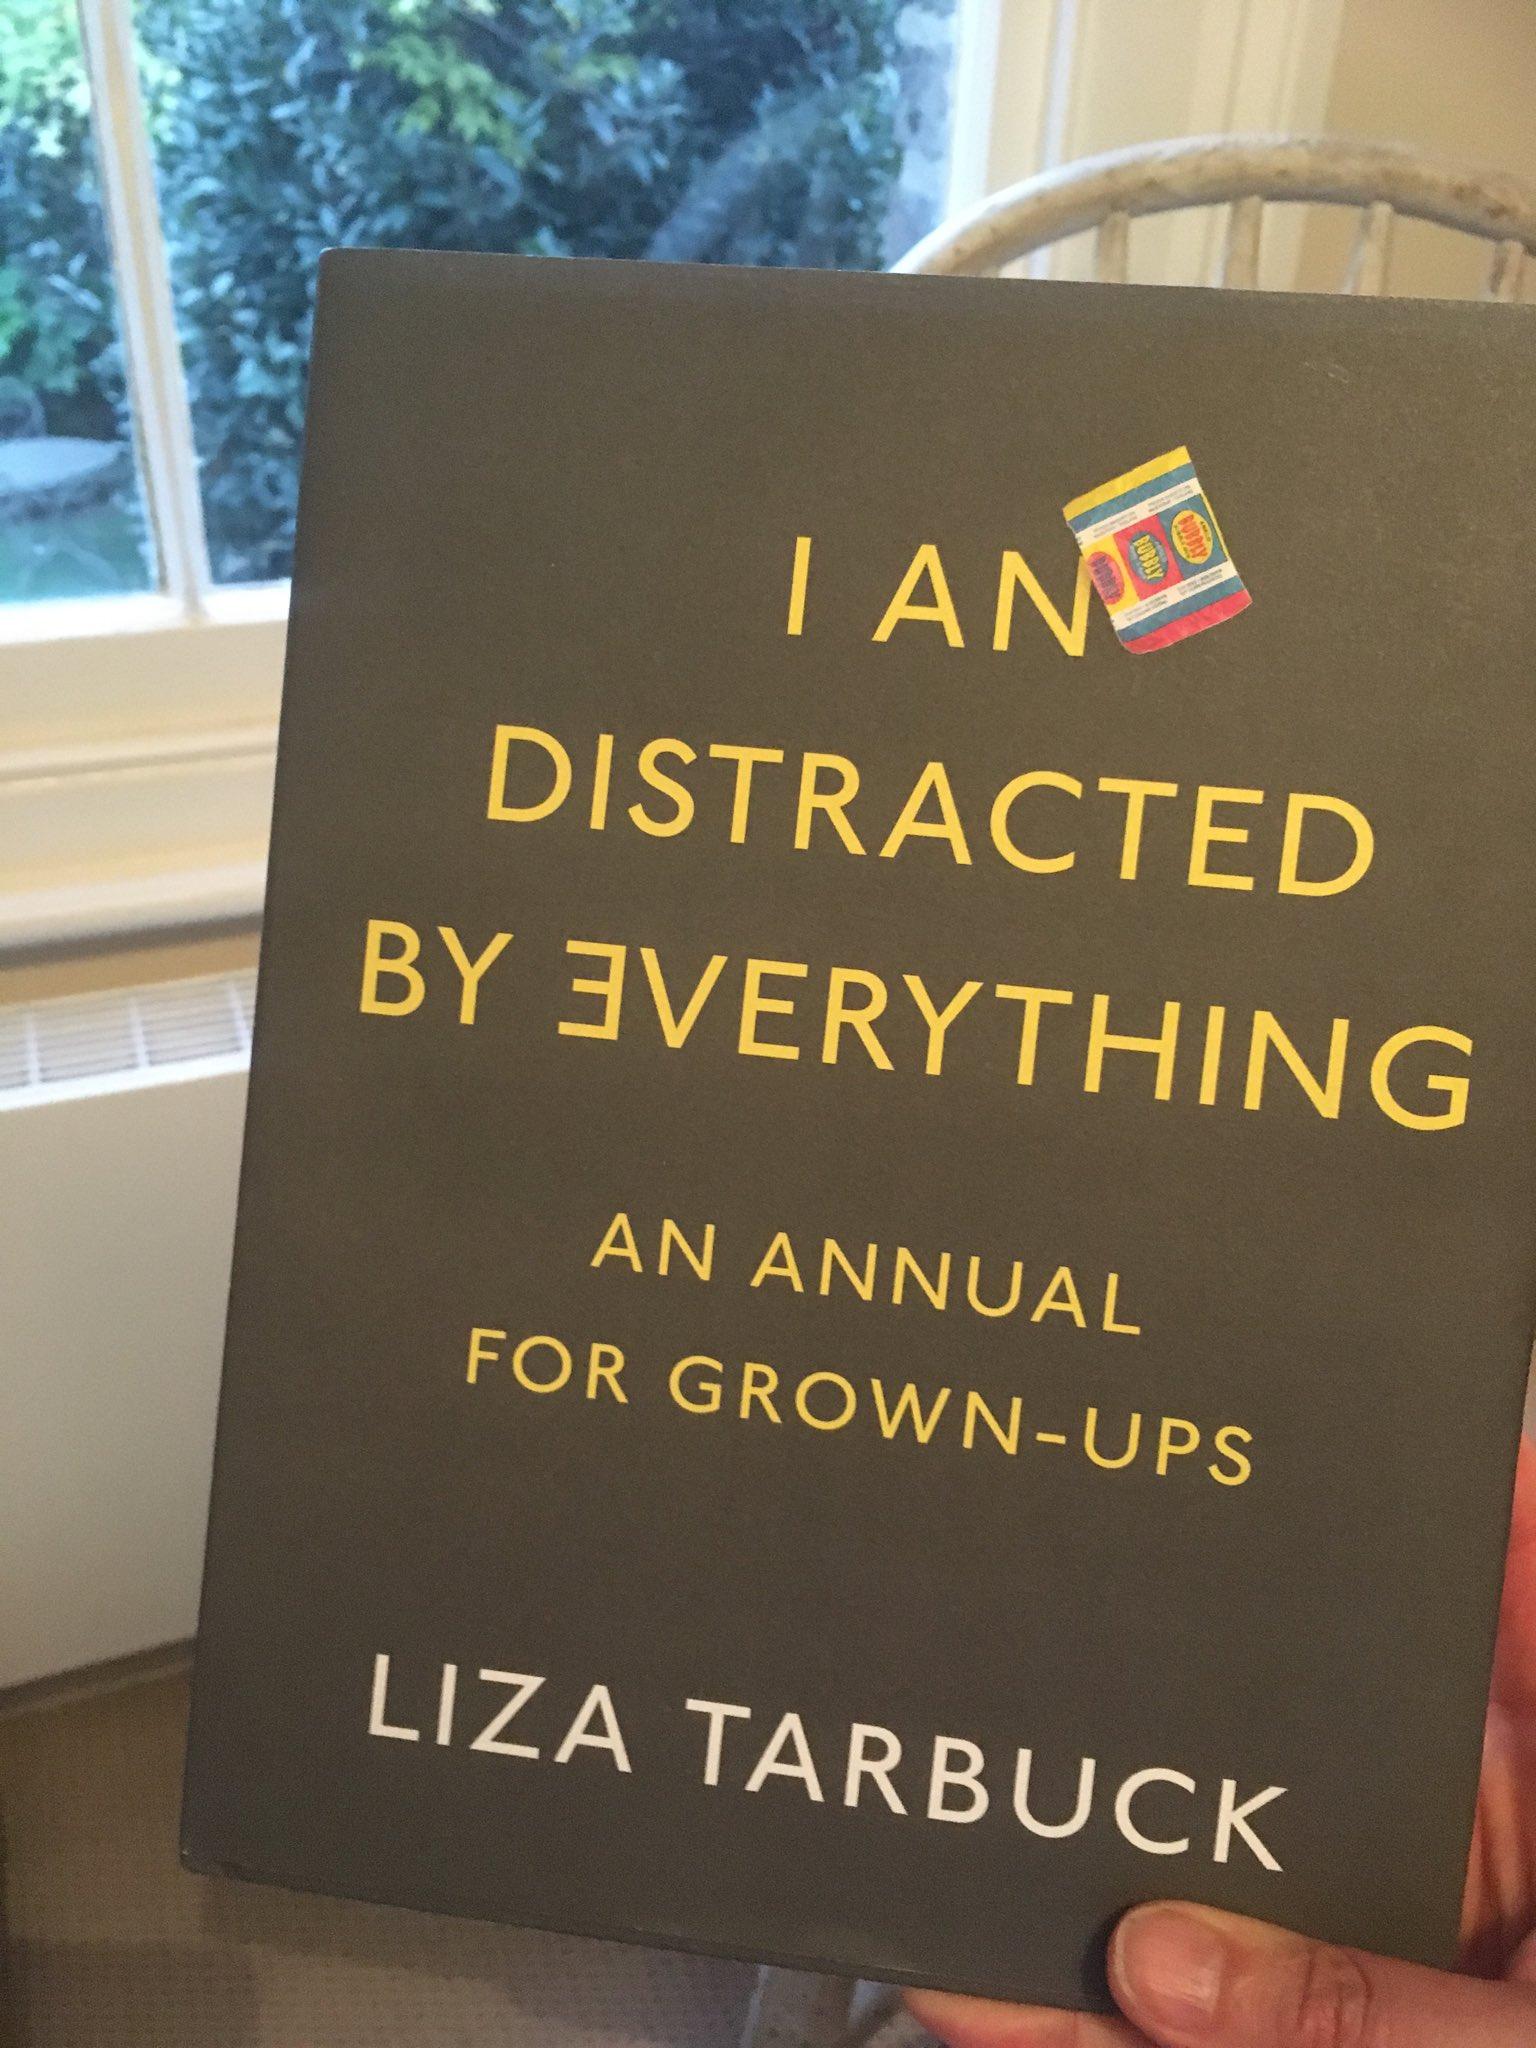 Oooh I do love Liza Tarbuck so... @PenguinRHUK https://t.co/Xl6XX8OlWP